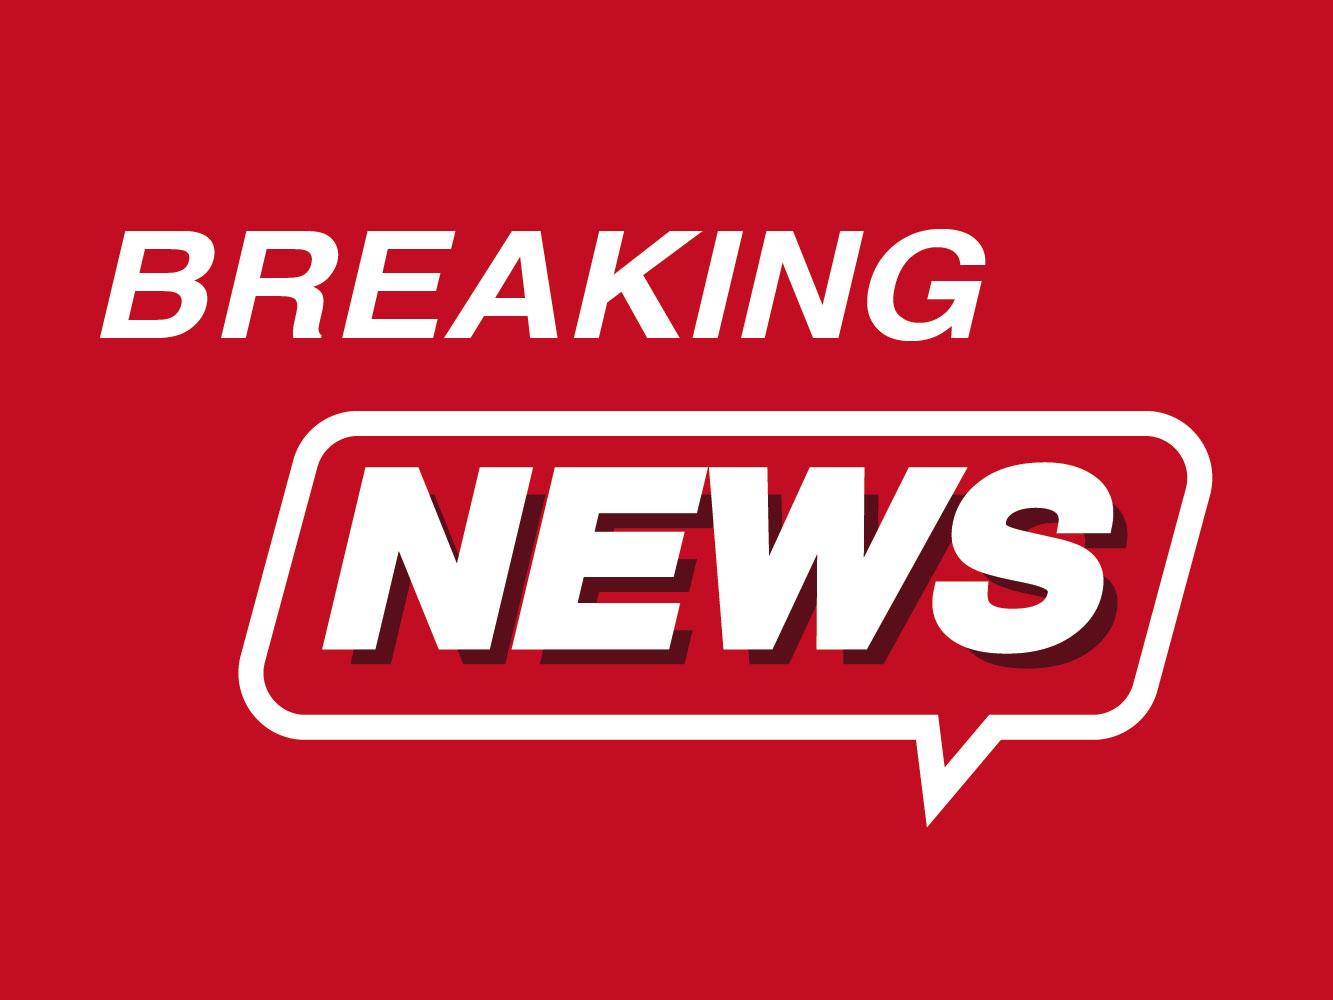 19 hurt in France building blaze: fire service